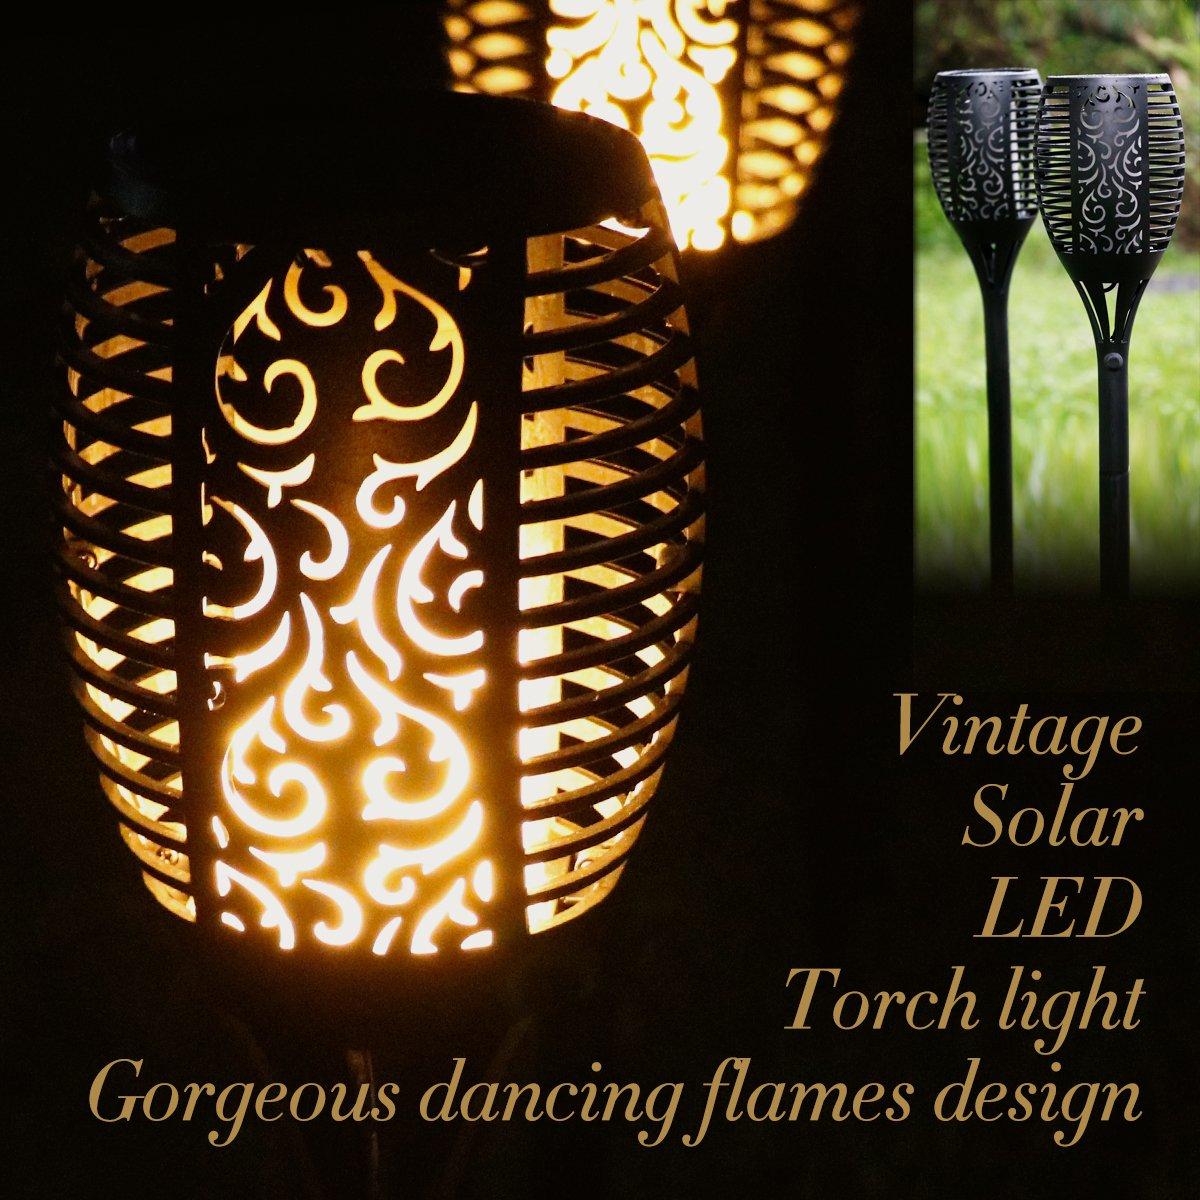 tiki wicks extra lamp torch lamps credit homemade bottle marie genna diy img wine